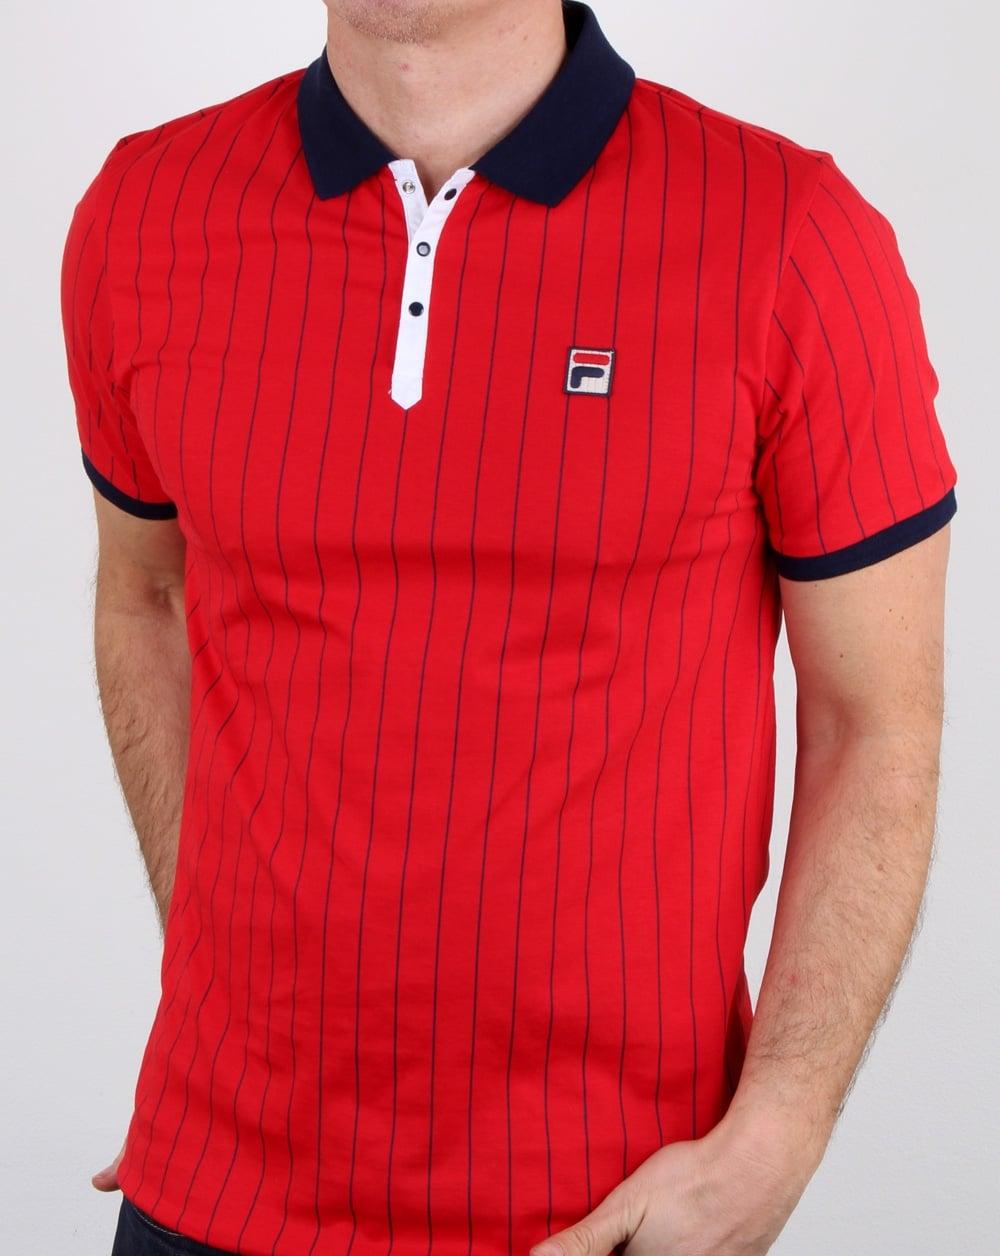 bae7e24f202d6 Fila Vintage Bb1 Polo Shirt Red,Mens,Polo,Stripe,Bjorn Borg,Wimbledon